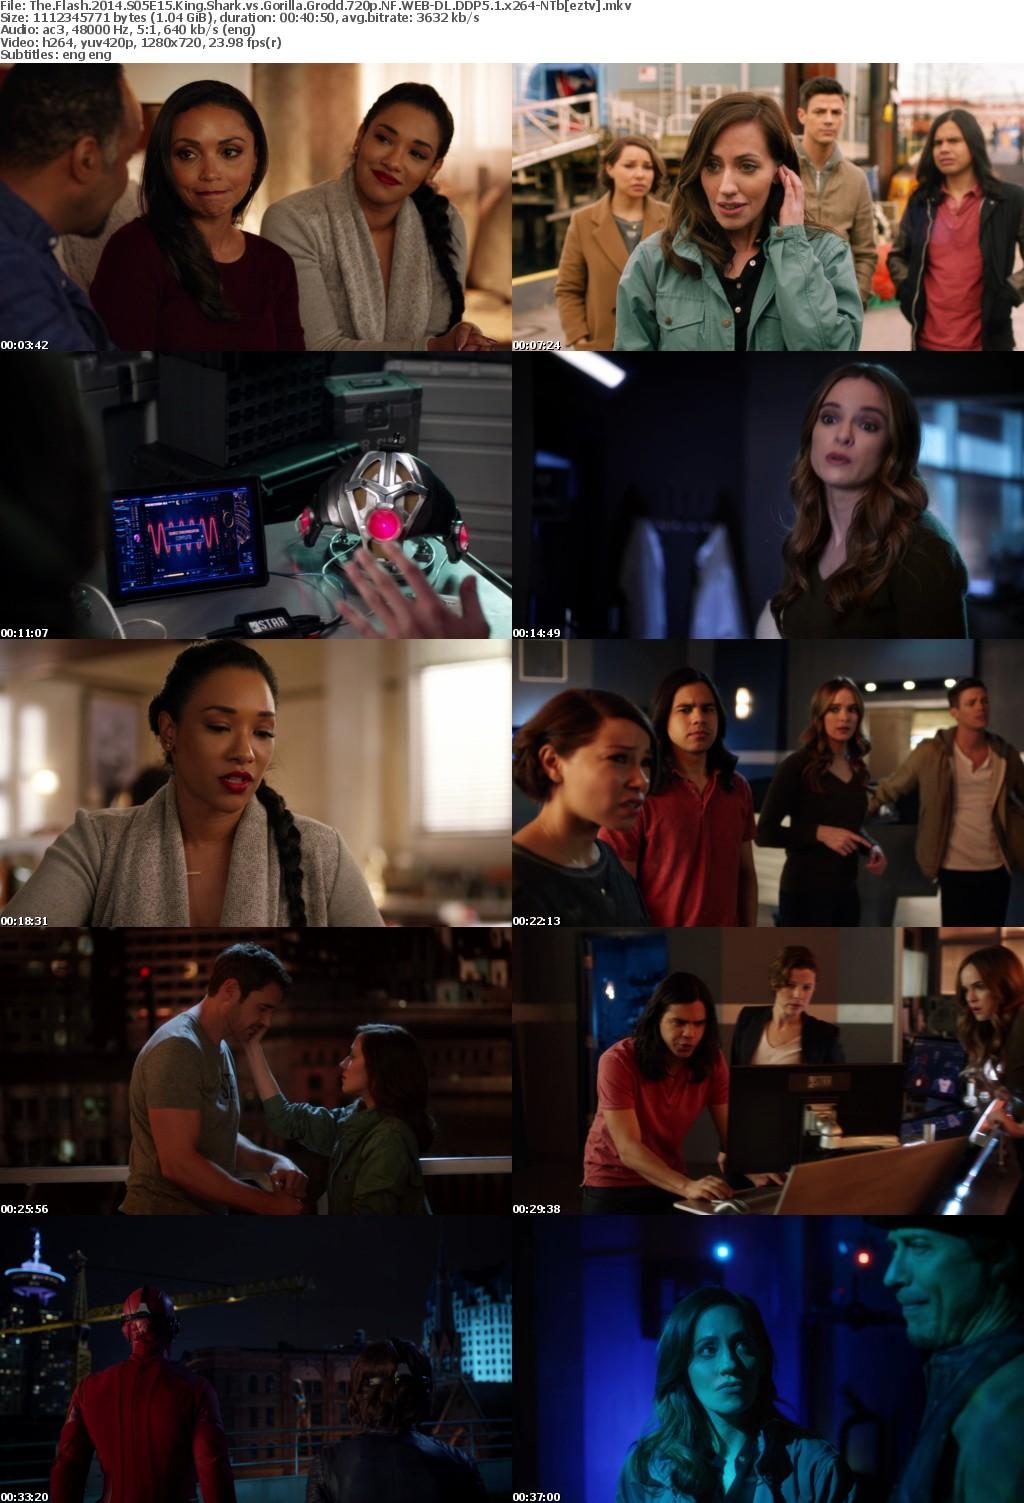 The Flash (2014) S05E15 King Shark vs Gorilla Grodd 720p NF WEB-DL DDP5.1 x264-NTb